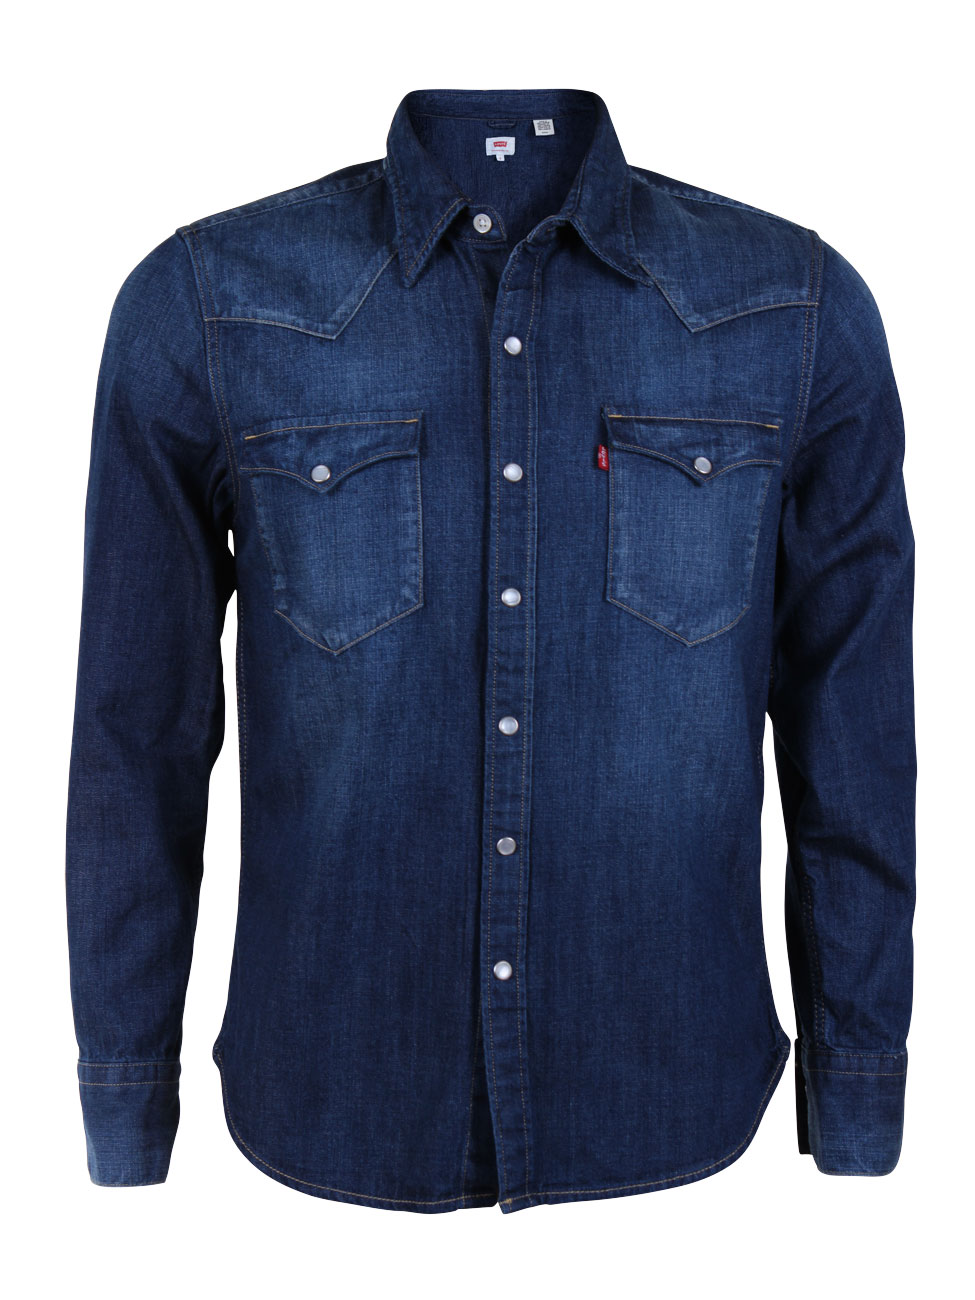 levi 39 s herren jeanshemd 65816 barstow western shirt ebay. Black Bedroom Furniture Sets. Home Design Ideas